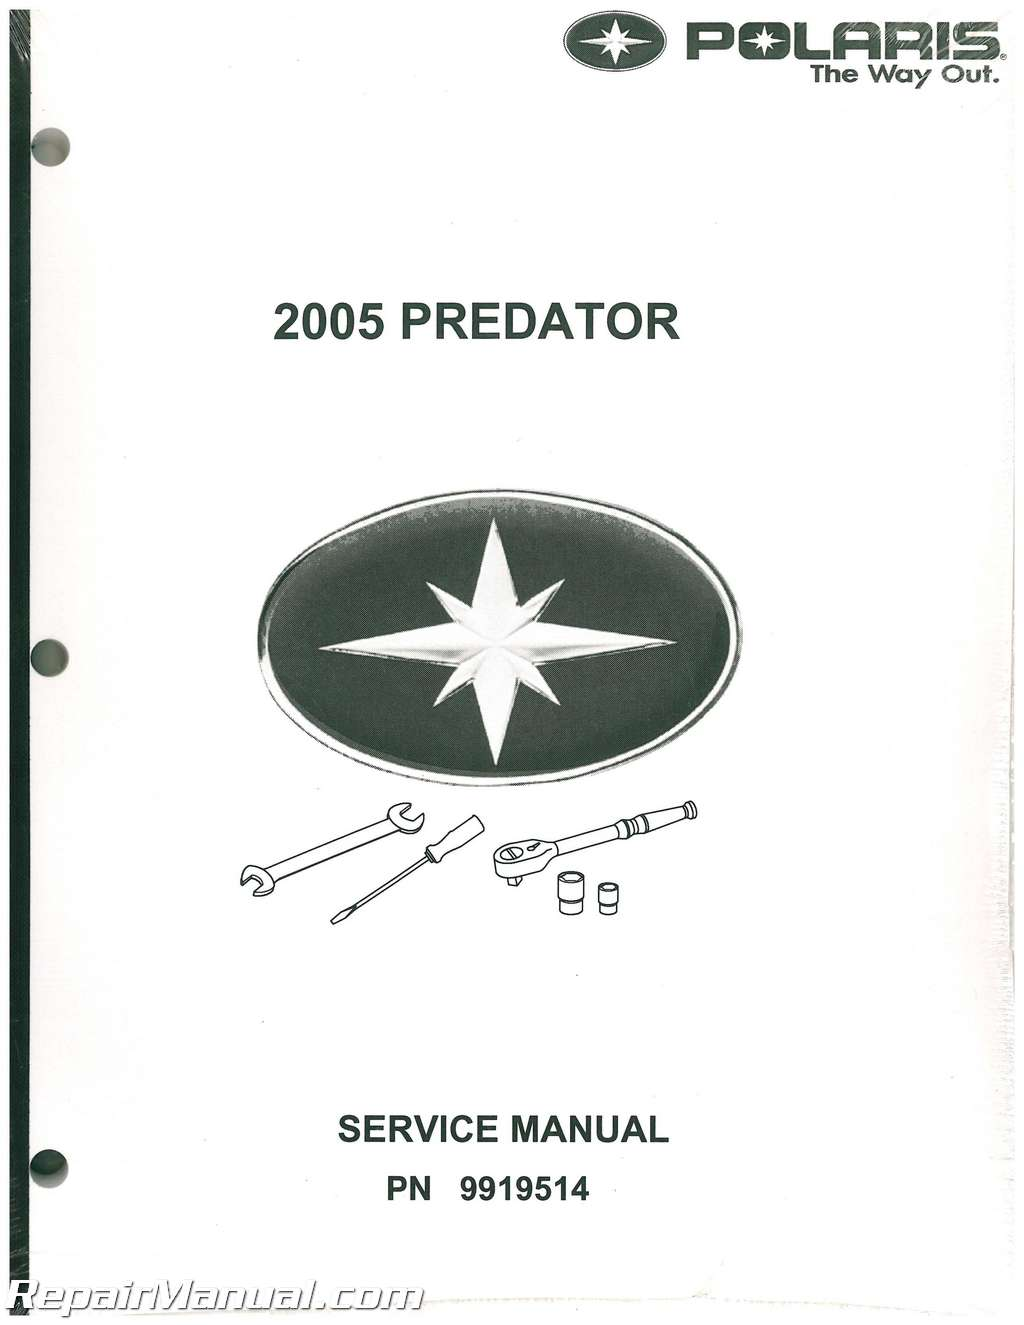 2005 polaris predator 500 service manual rh repairmanual com polaris predator 500 service manual 2006 polaris predator 500 service manual pdf